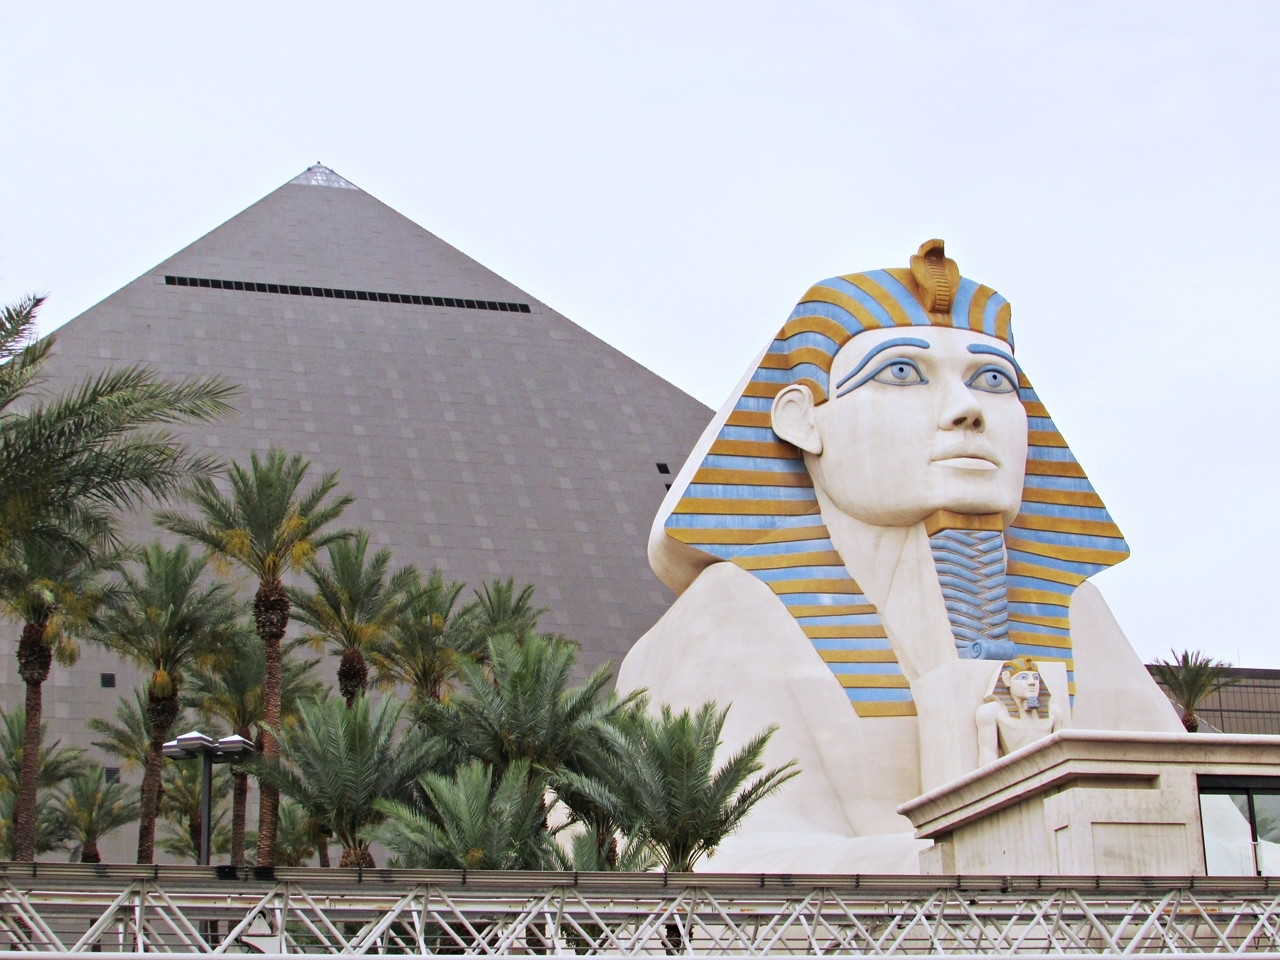 USA Rundreise - Amerika Westküste - Las Vegas Luxor - Fashionladyloves